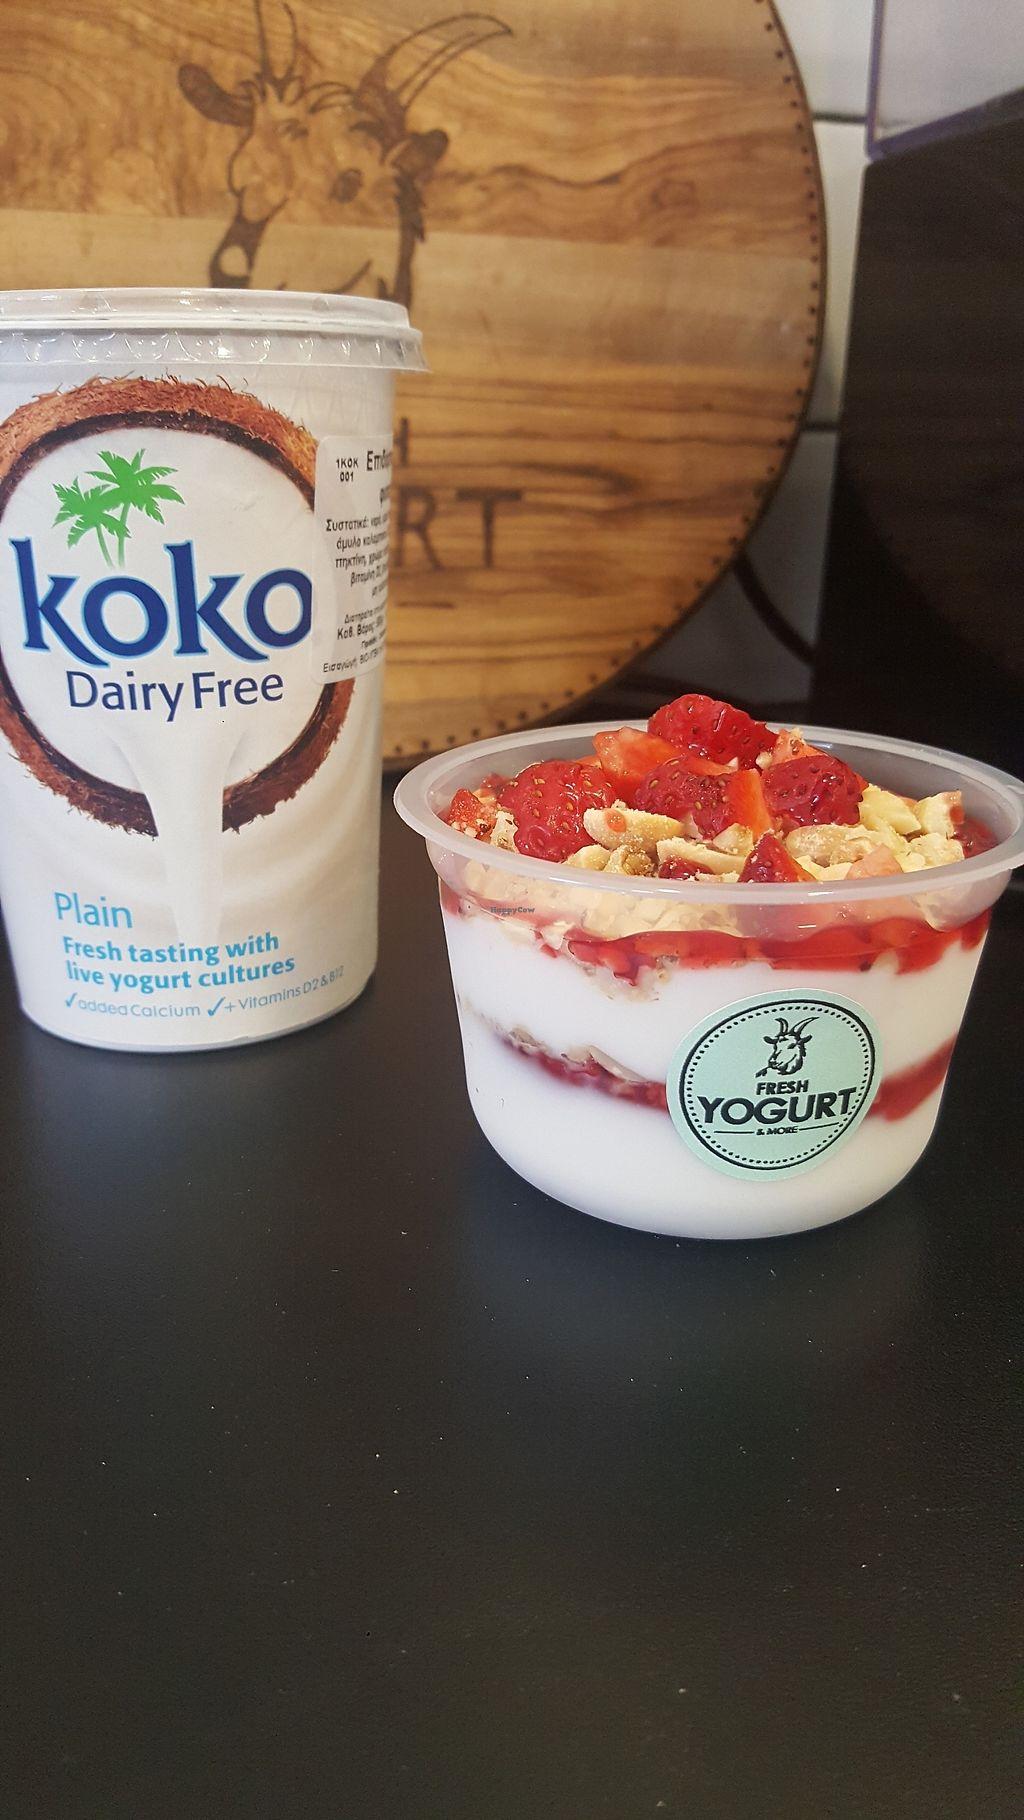 "Photo of Fresh Yogurt & More  by <a href=""/members/profile/EvageliaTsampala"">EvageliaTsampala</a> <br/>Coconut yogurt with fresh strawberries-nuts & chia seeds  <br/> February 21, 2018  - <a href='/contact/abuse/image/107353/362007'>Report</a>"